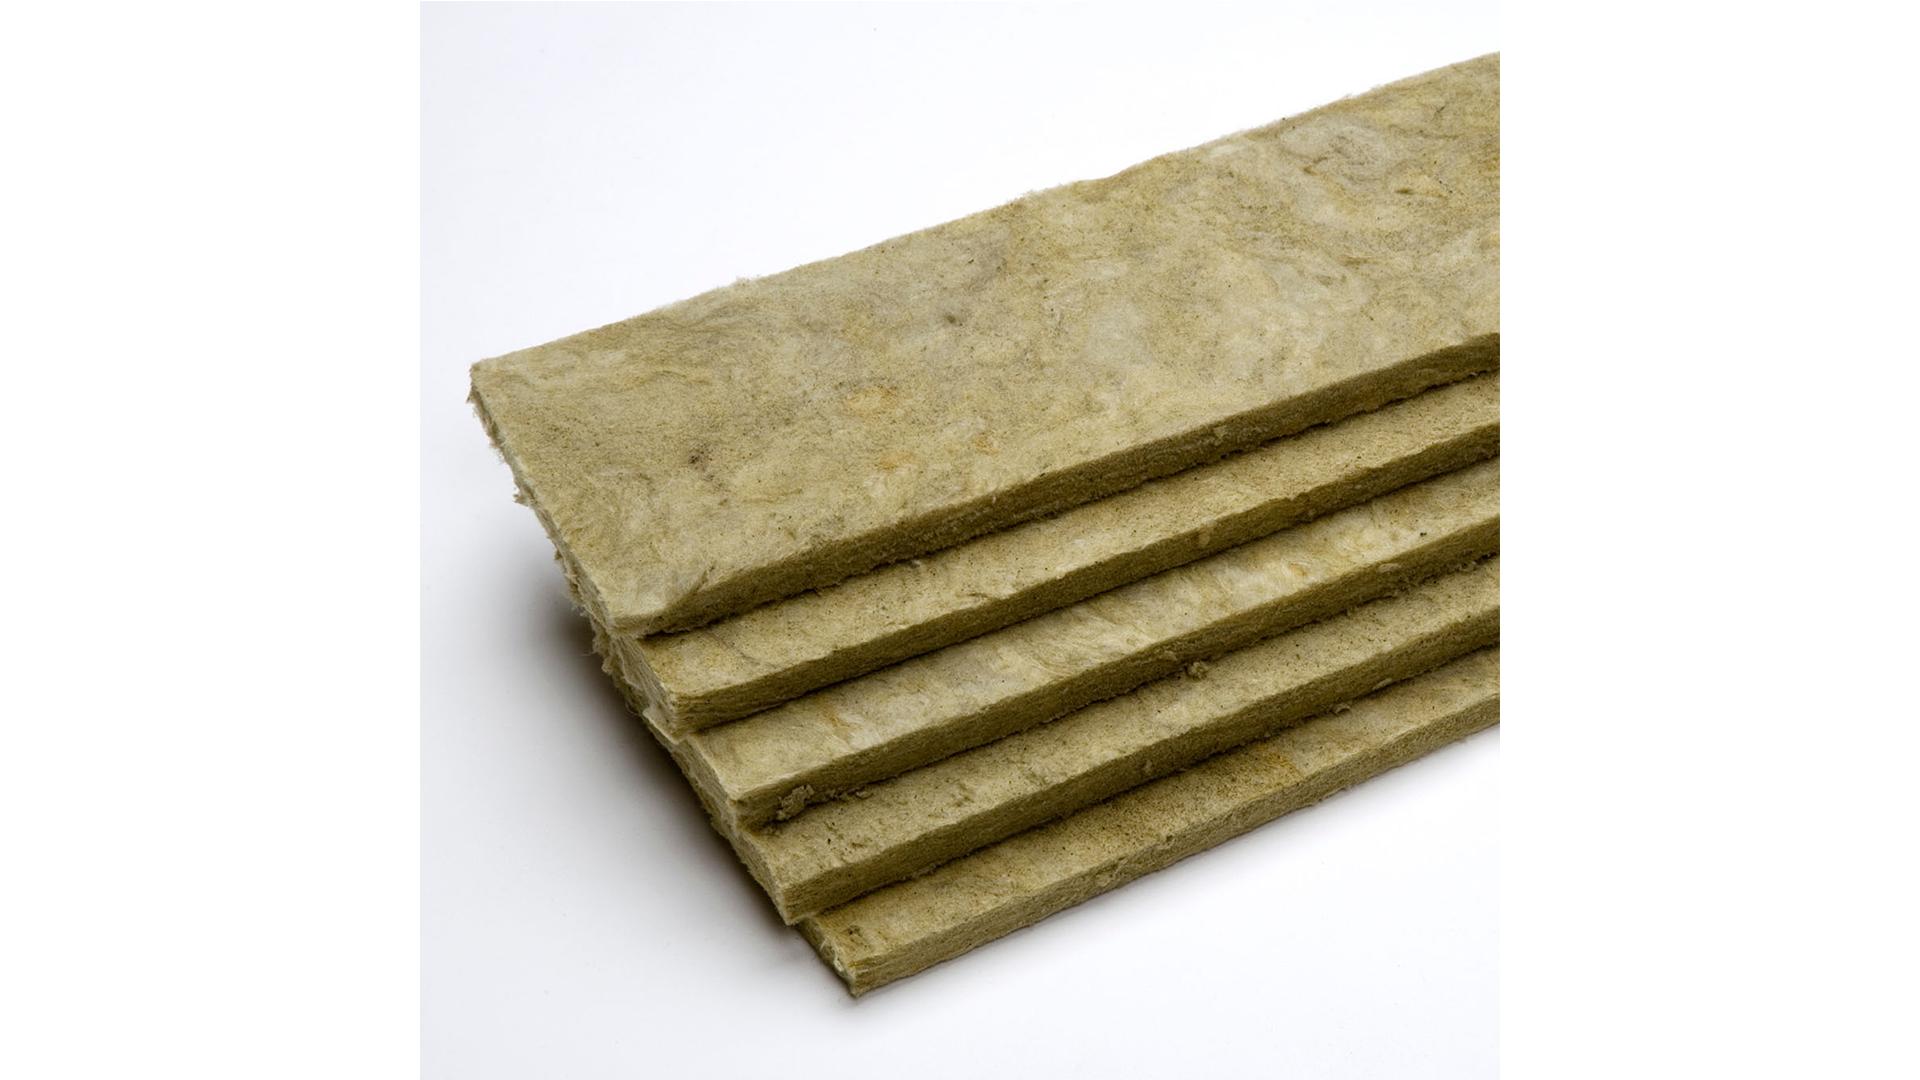 RockTect Floor Strip, productfoto, accessoires